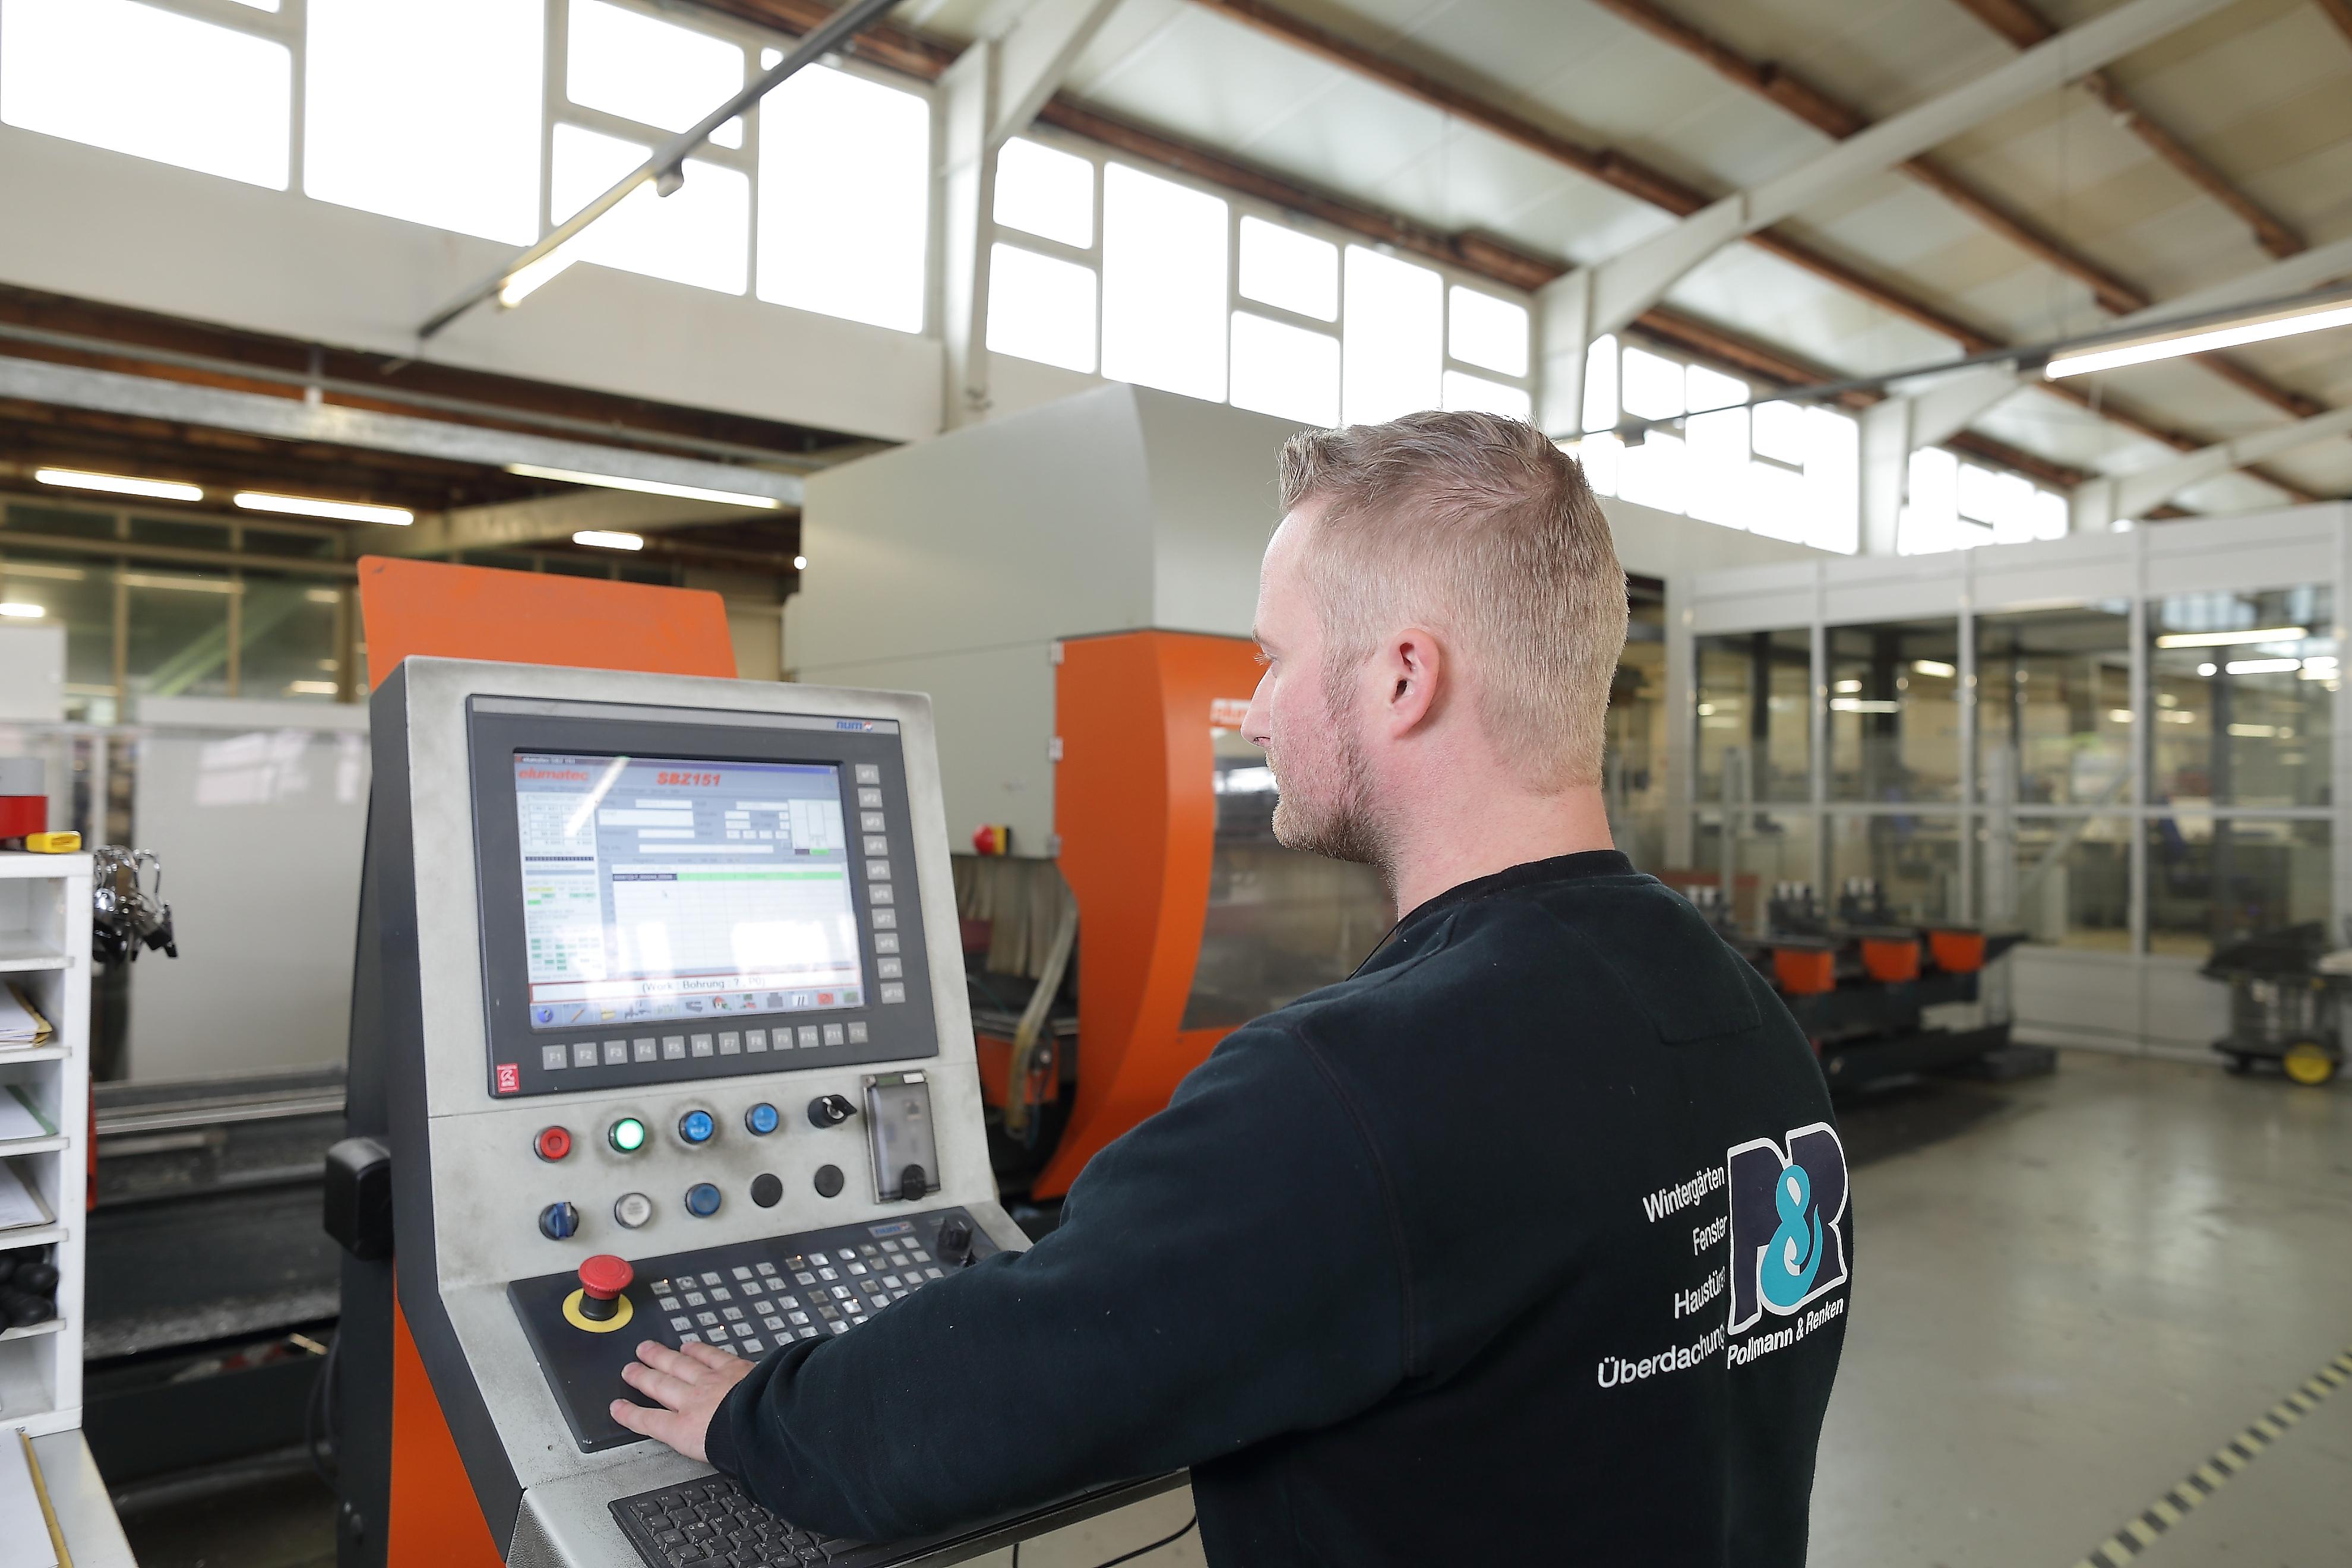 S49B2390.JPG – Pollmann & Renken GmbH